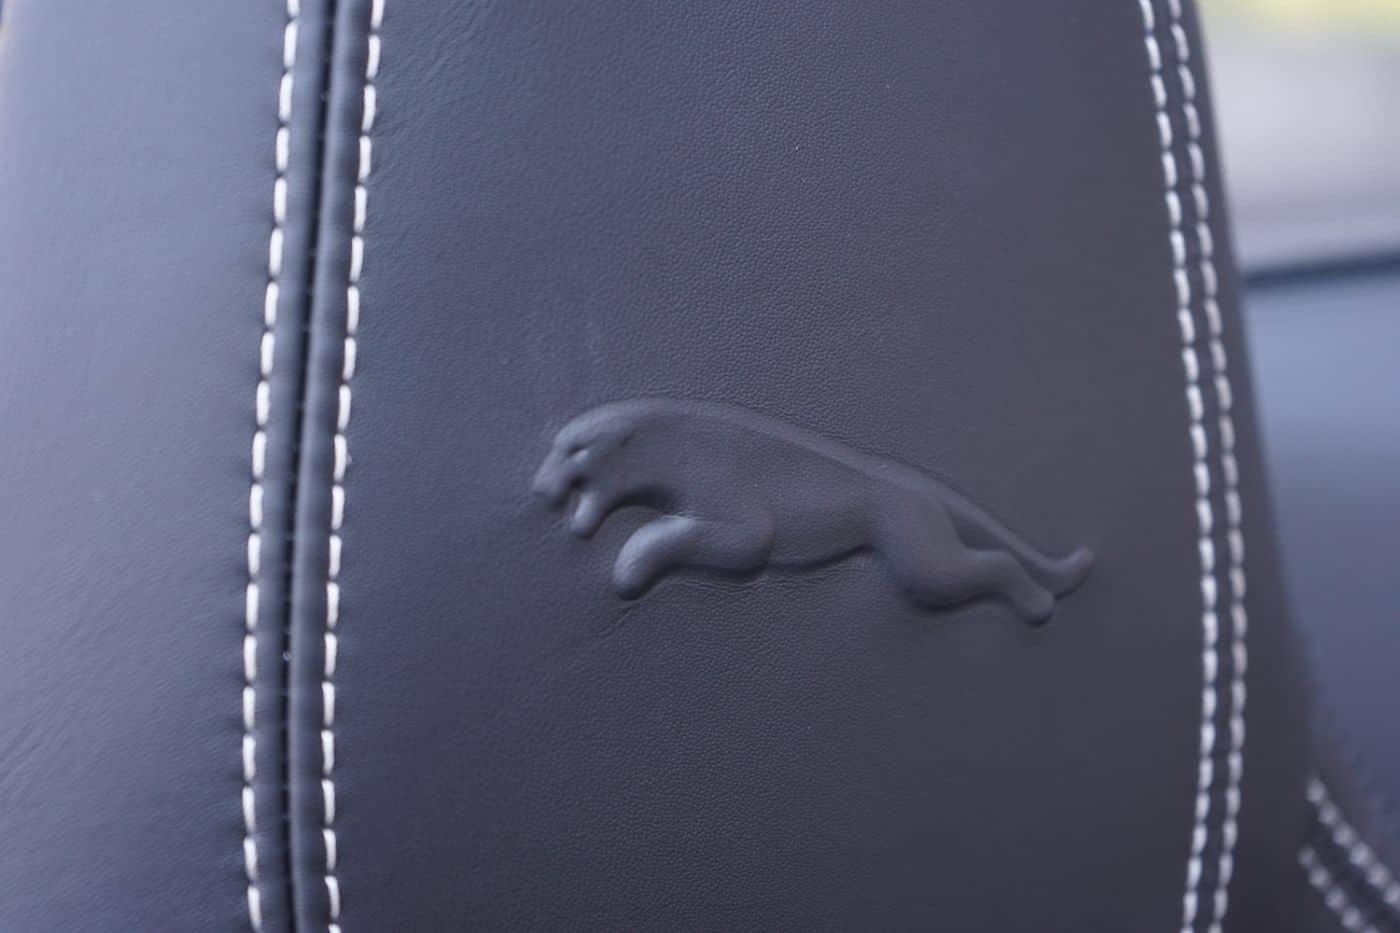 Jaguar F-TYPE P300 First Edition Cabrio 2020 - Meine Eindrücke zum F-Type - Sound I POV I Autobahn I